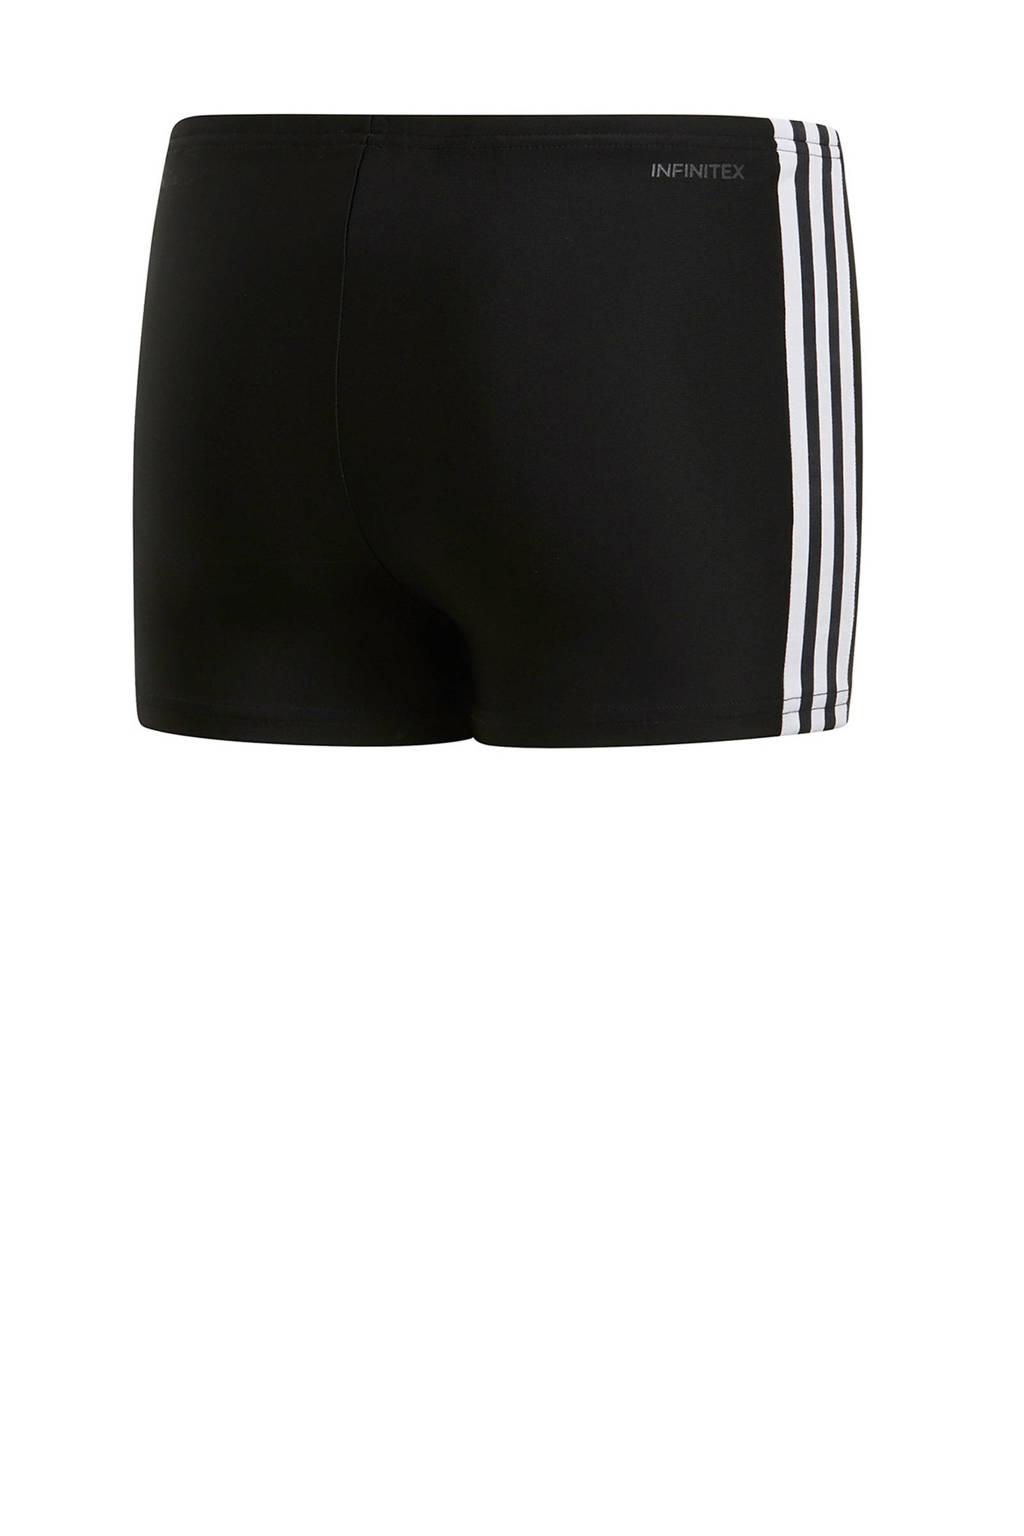 adidas Performance infinitex zwemboxer 3-stripes zwart, Zwart